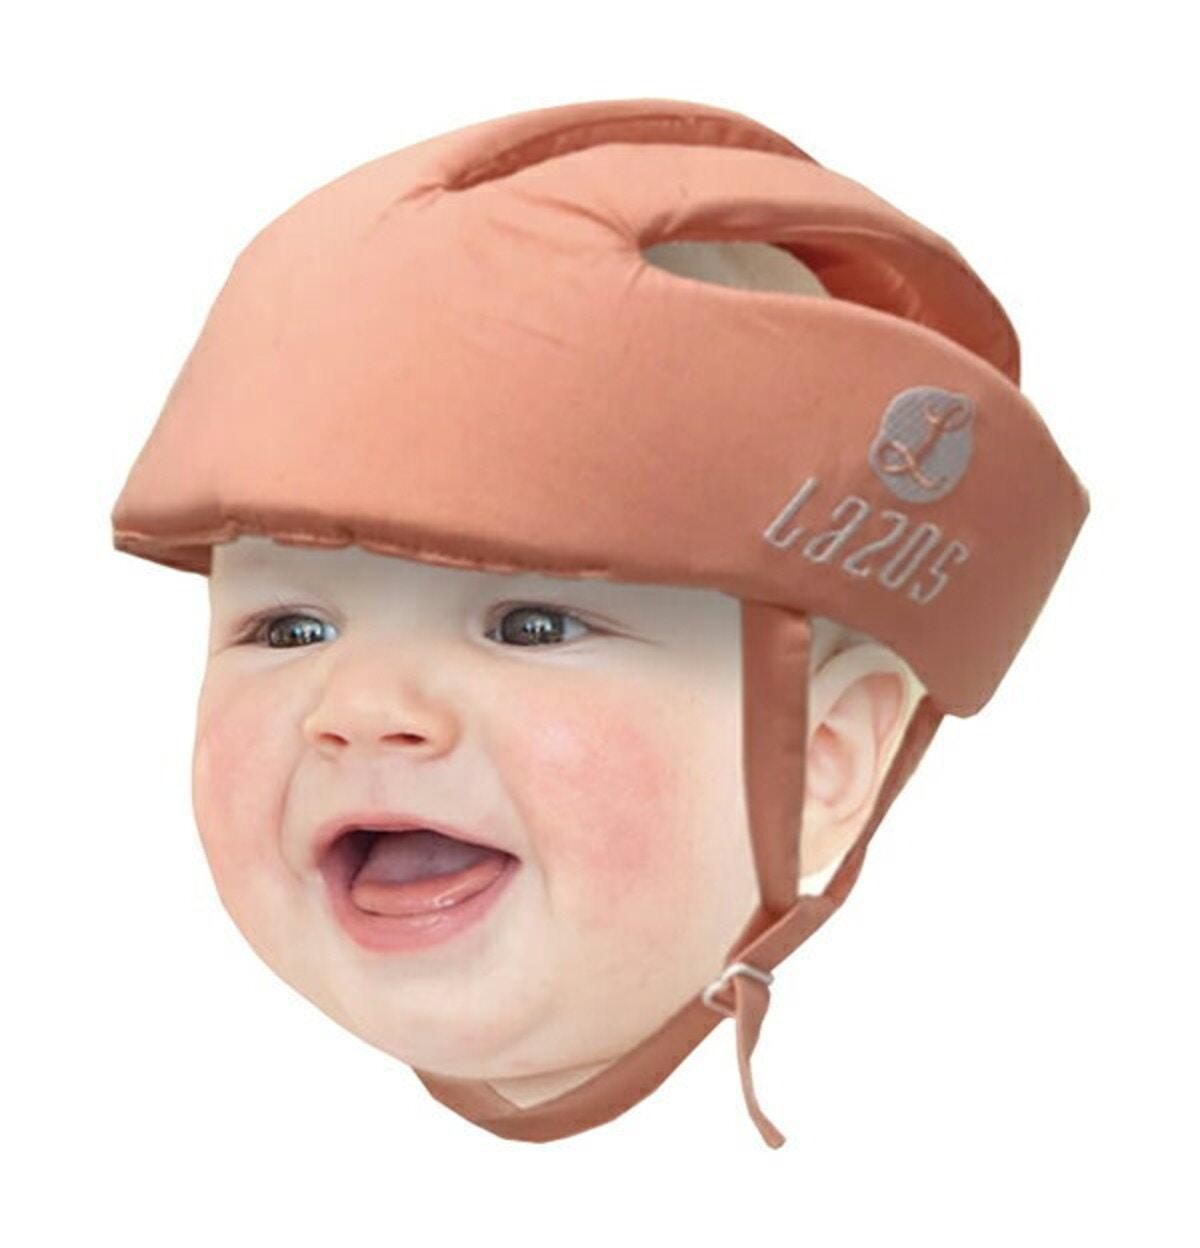 LAZOS(ラソス) ベビー用ヘルメット